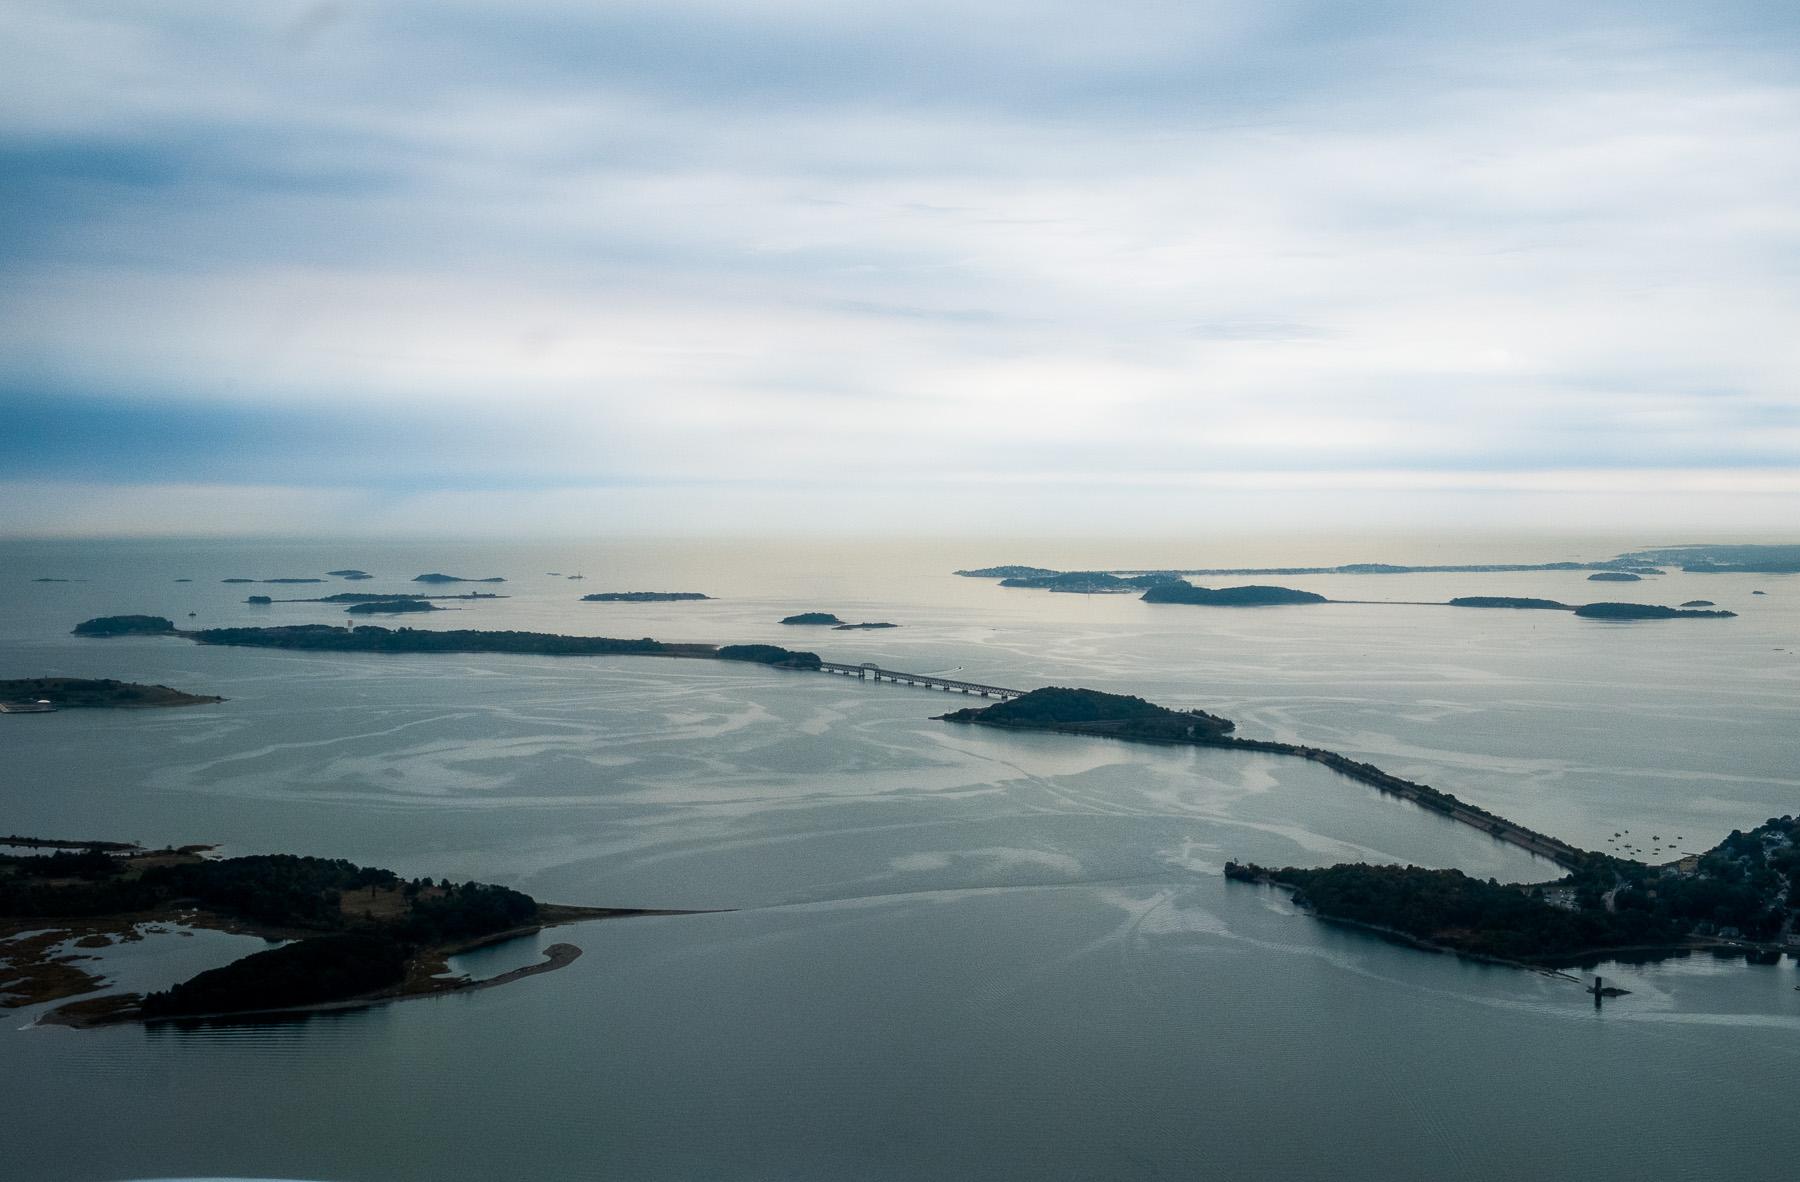 Departing BOS: Boston Harbor